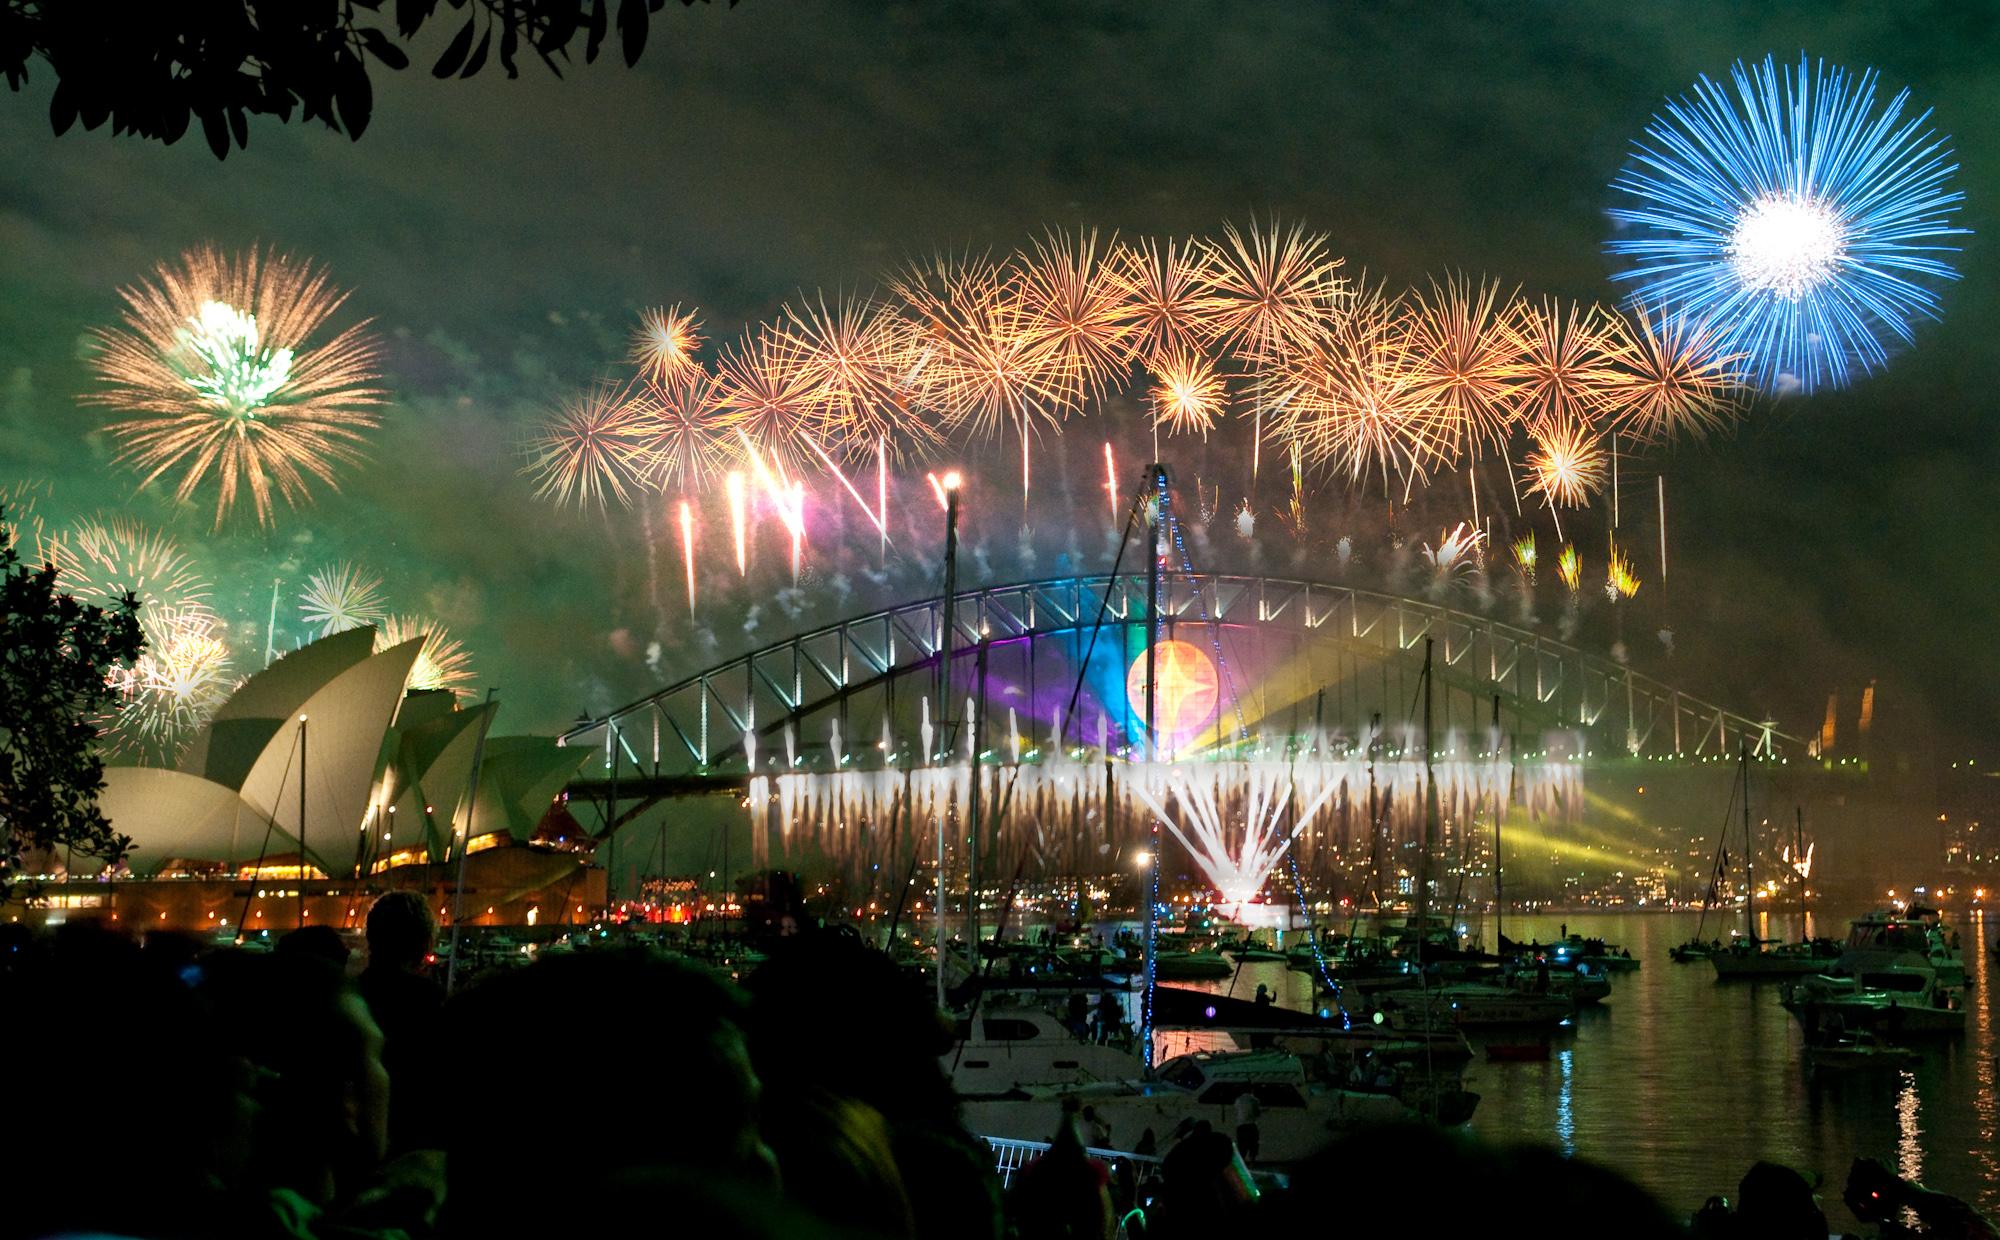 Sydney_habour_bridge_&_opera_house_fireworks_new_year_eve_2008-2